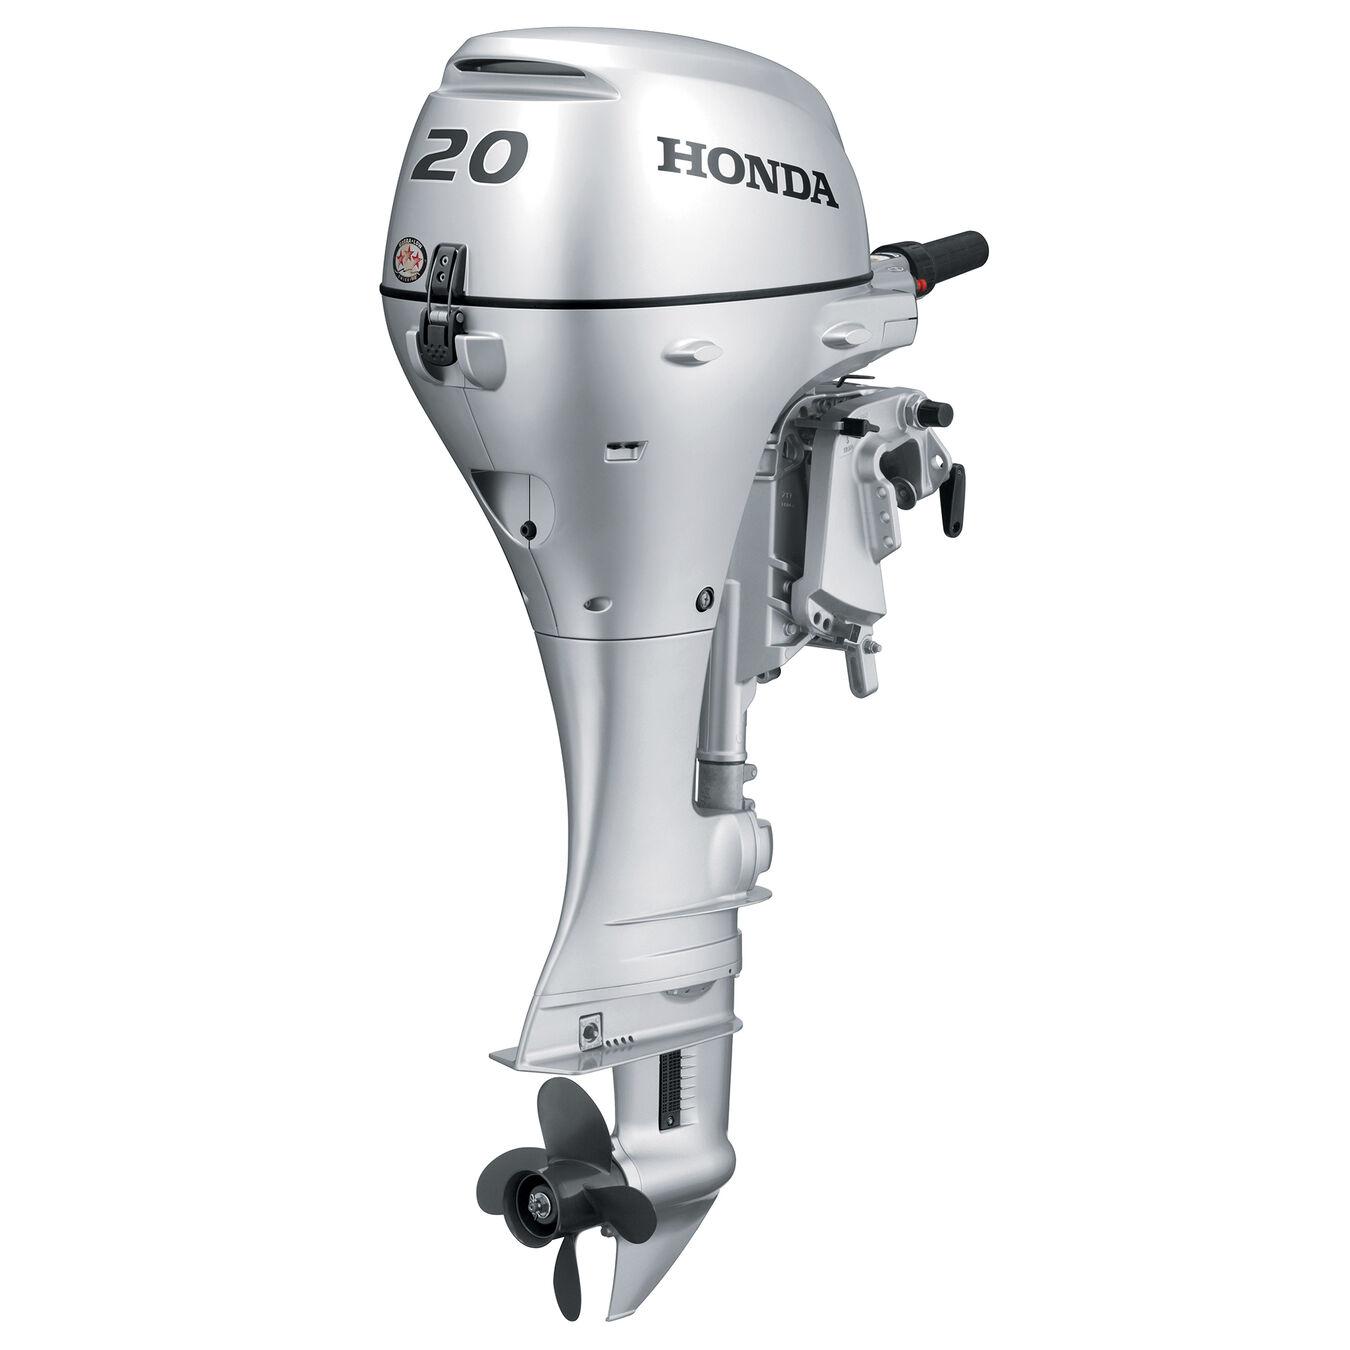 Honda Bf20 Portable Outboard Motor Manual 20 Hp 15 Shaft